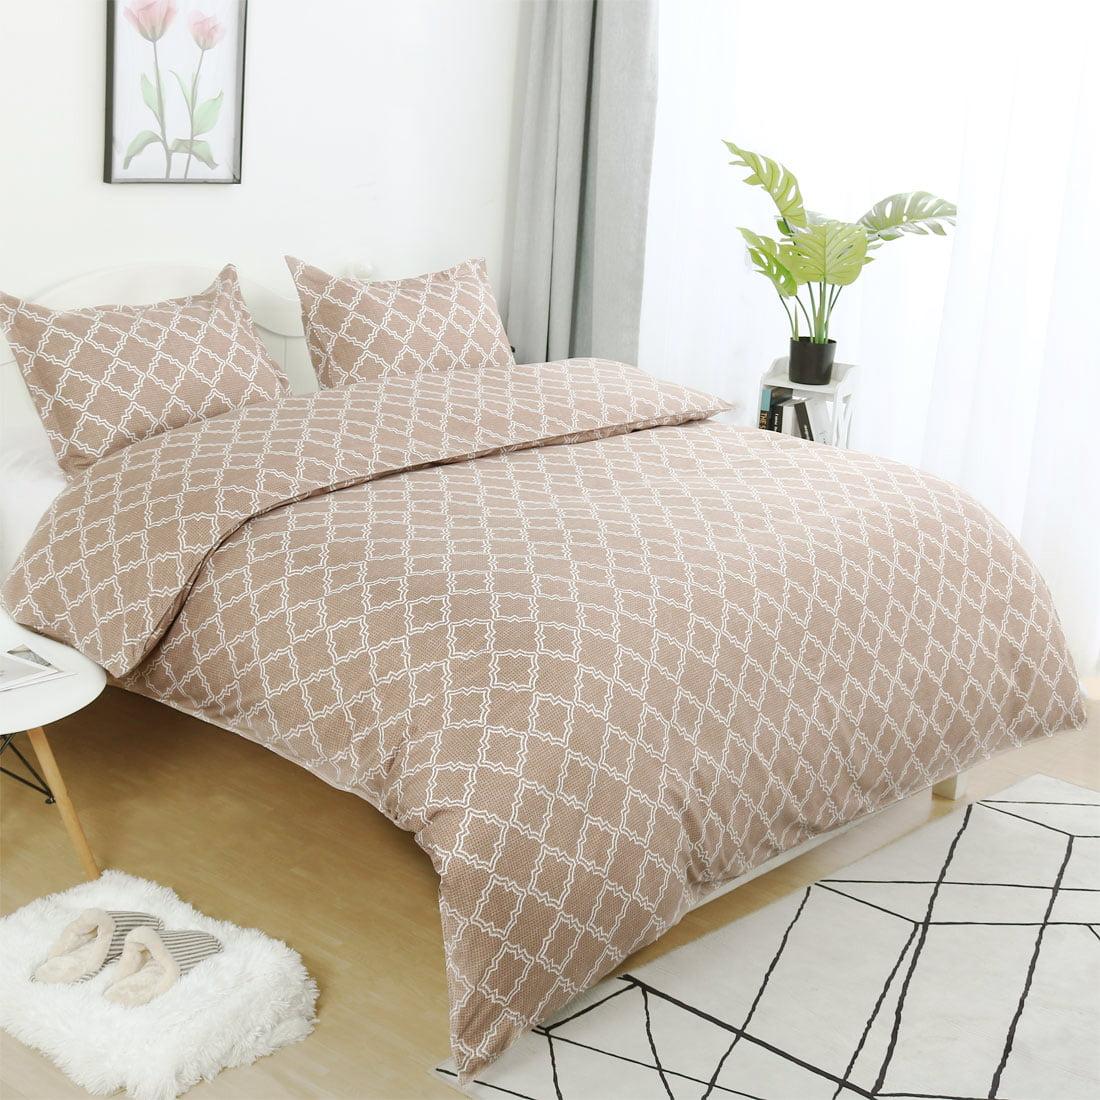 Lattice Pattern Microfiber Duvet Cover Set with 2 Pillow Shams